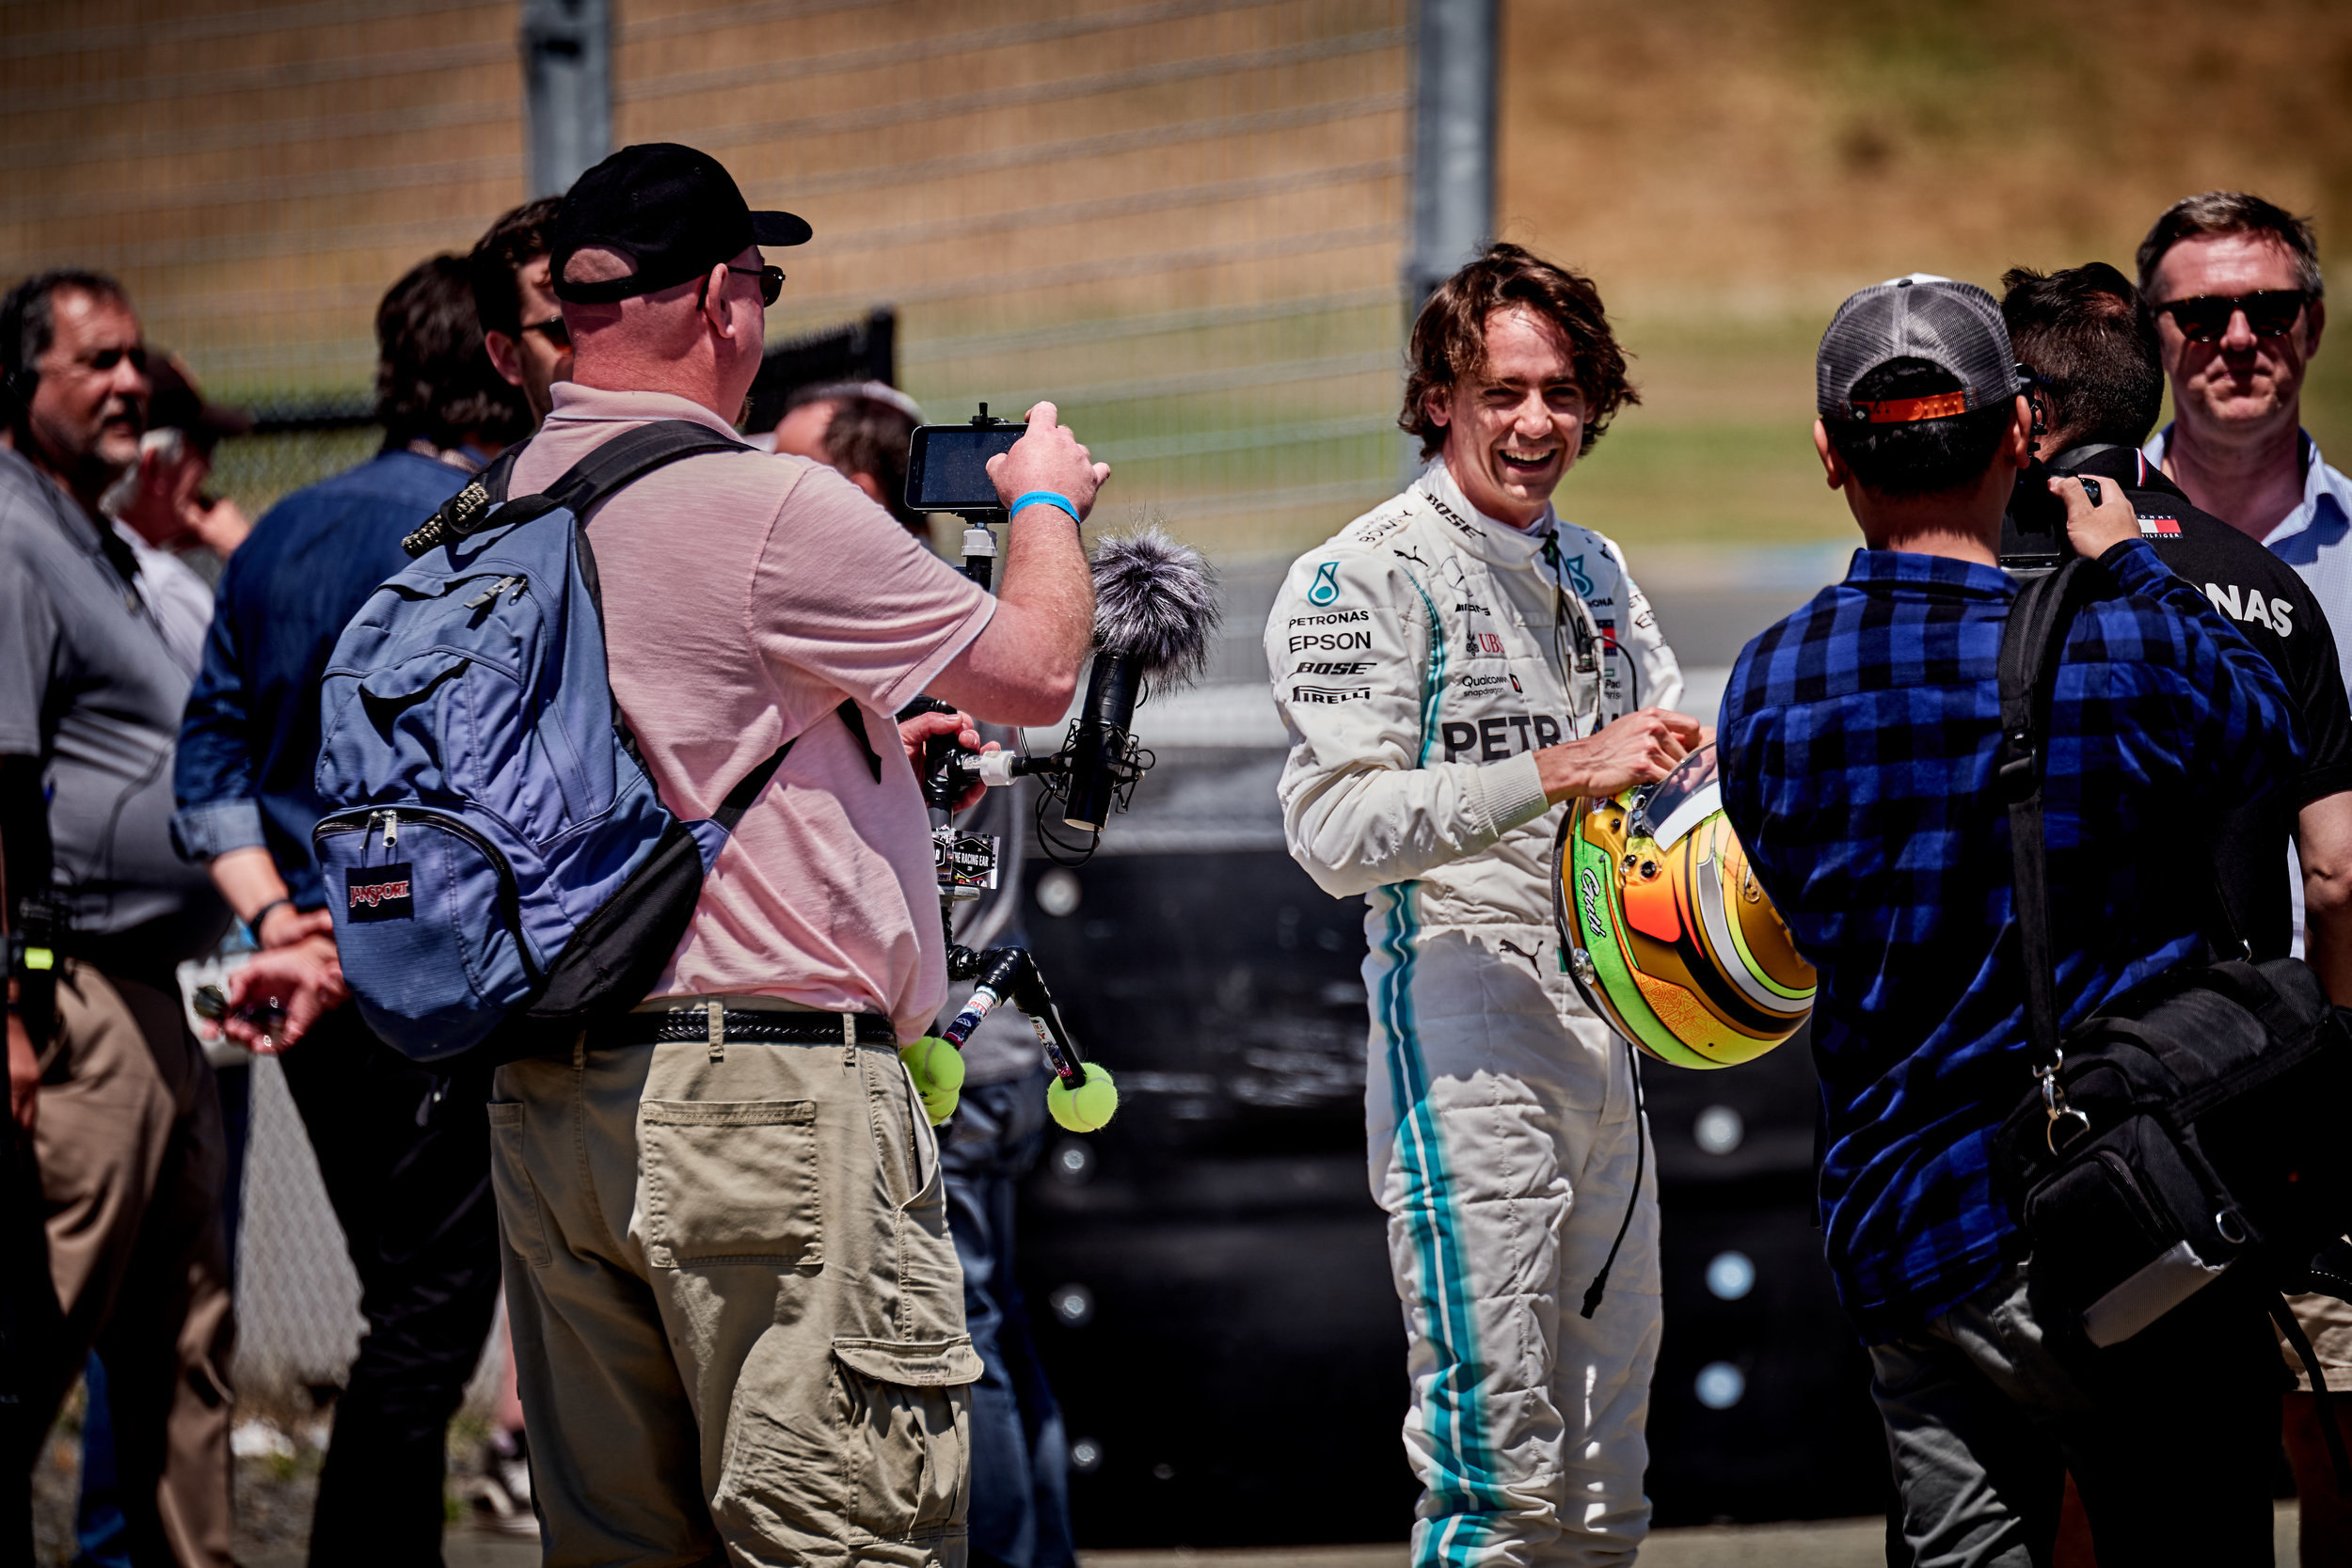 Esteban Gutierrez, Official Development Driver for Mercedes-AMG Petronas Motorsport Formula I team enjoying a moment after a demonstration of five-times World Champion Driver Lewis Hamilton's 2016 Mercedes W07 Hybrid Formula I car.